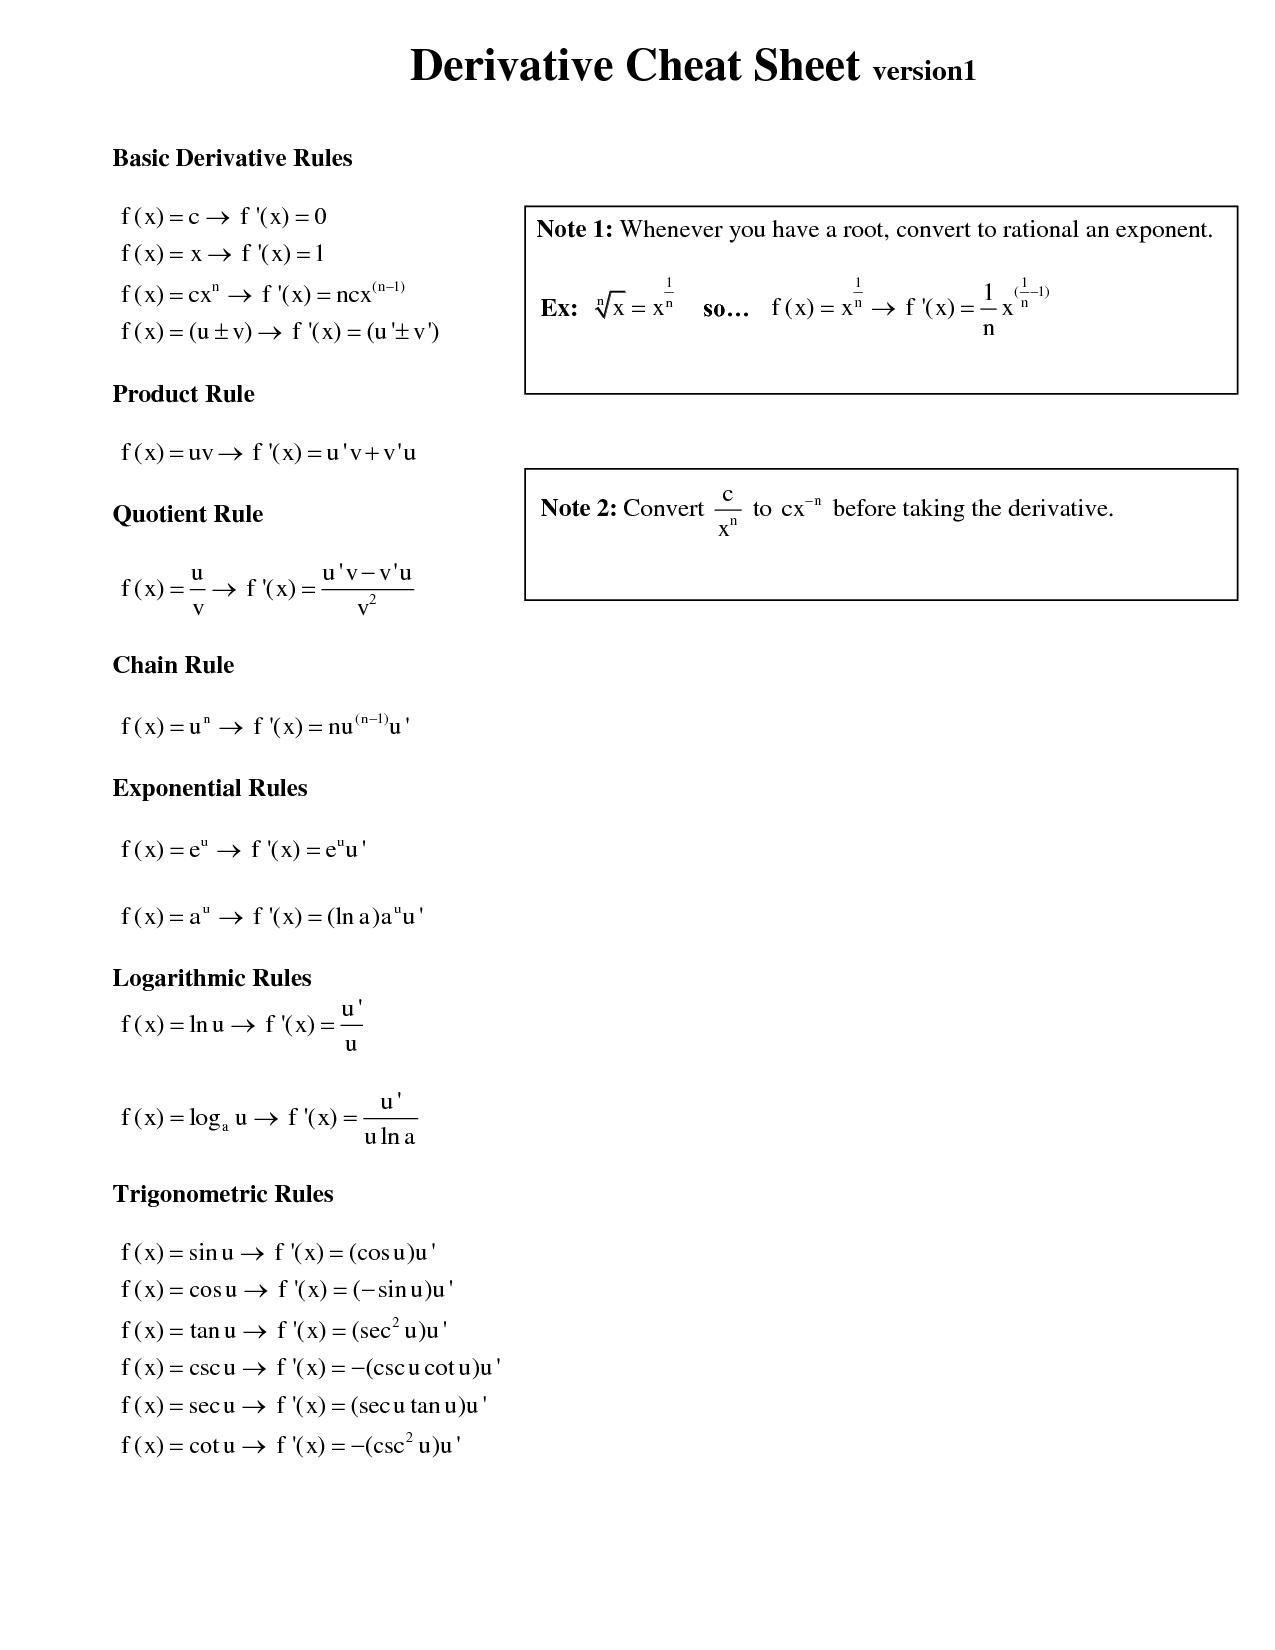 differentiation cheat sheet Derivative rules d ()xnnxn1 dx = − ()sin cos d x x dx = ()cos sin d x x dx =− d ()aax ln x dx =⋅a ()tan sec2 d x x dx = ()cot csc2 d x x dx =− ()() () () d f xgx fxgx gx fx dx ⋅=⋅ +⋅′′ ()sec sec tan d x x dx = x ()csc csc cot d x xx dx =− ()2 dfx gxfx fxgx.